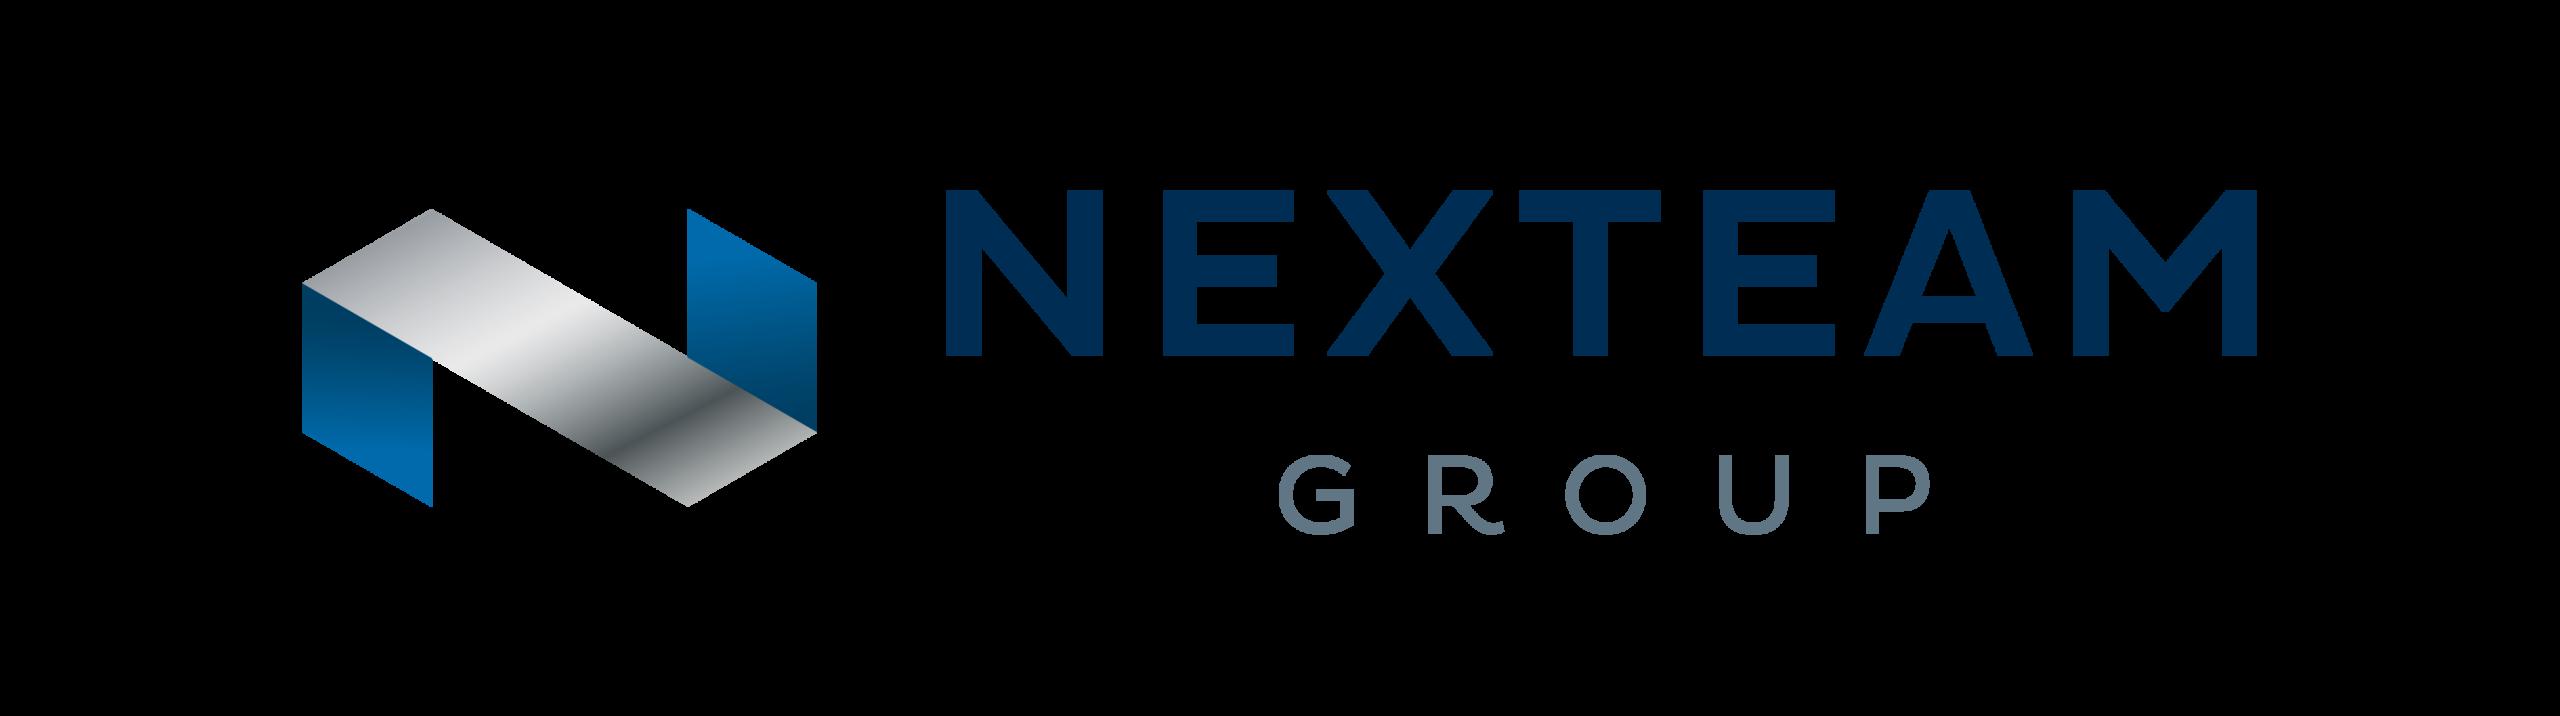 NEXTEAM-GROUP_Logo